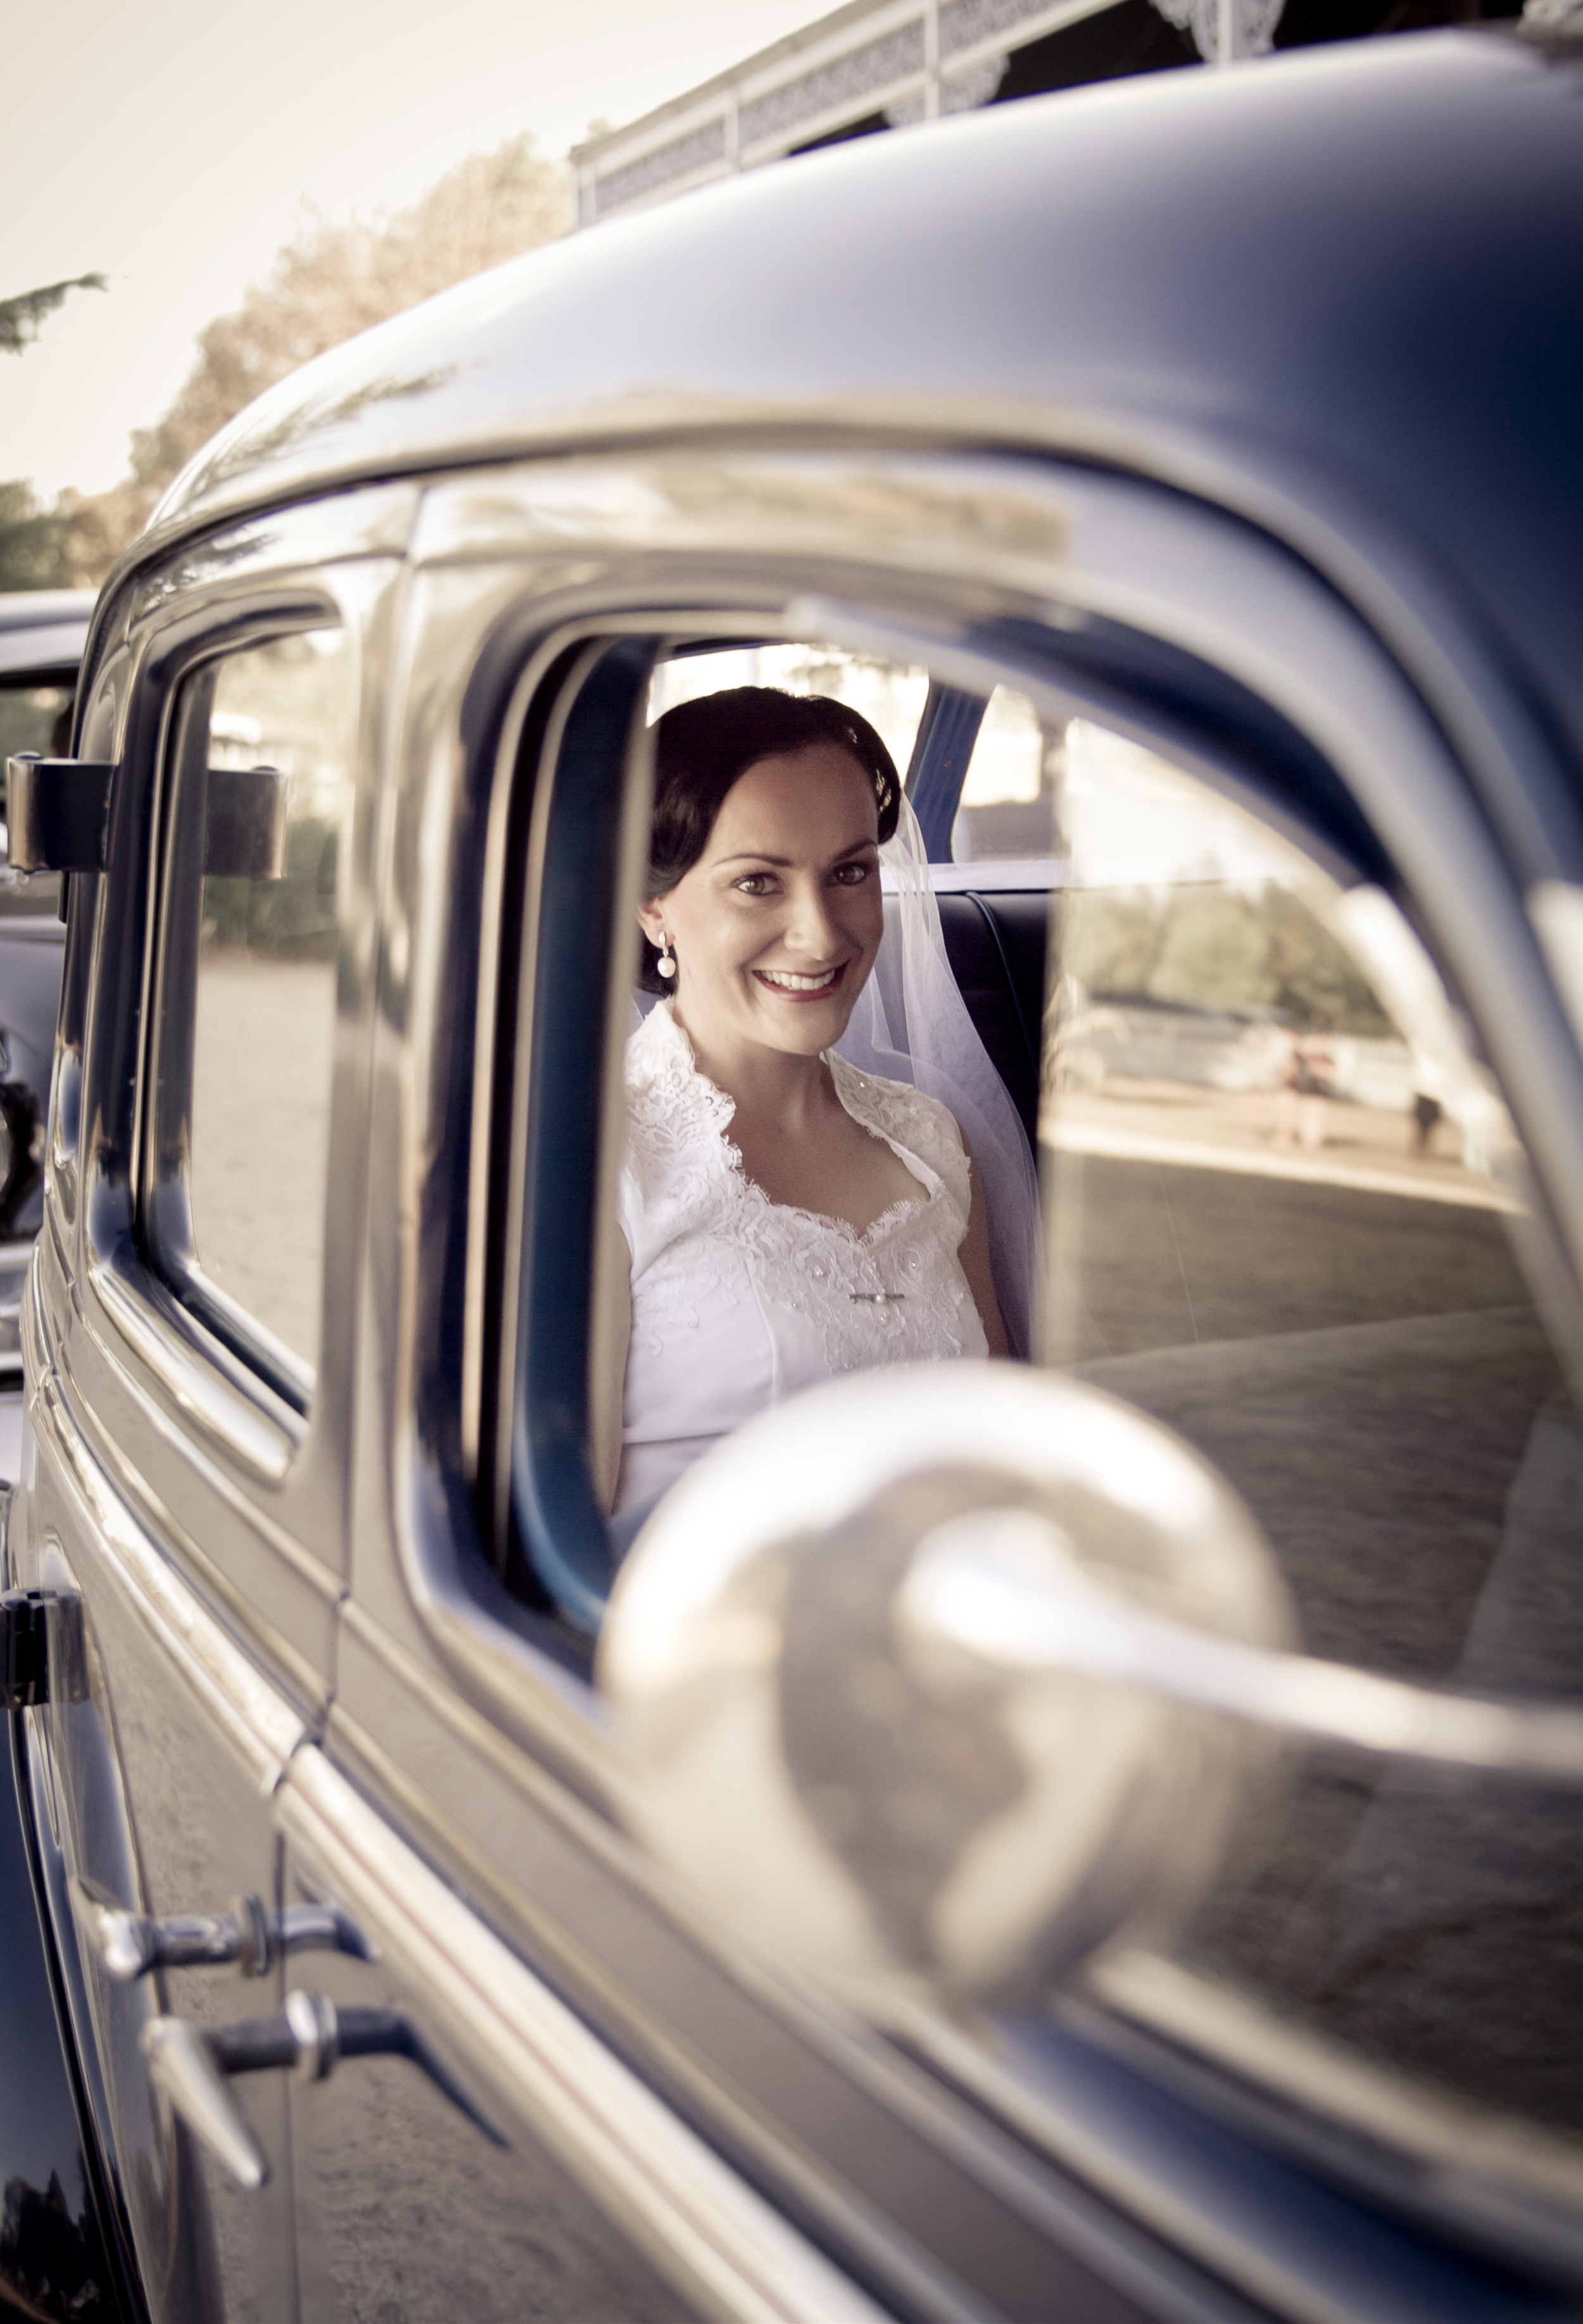 1 Bride in Wedding Car.jpg